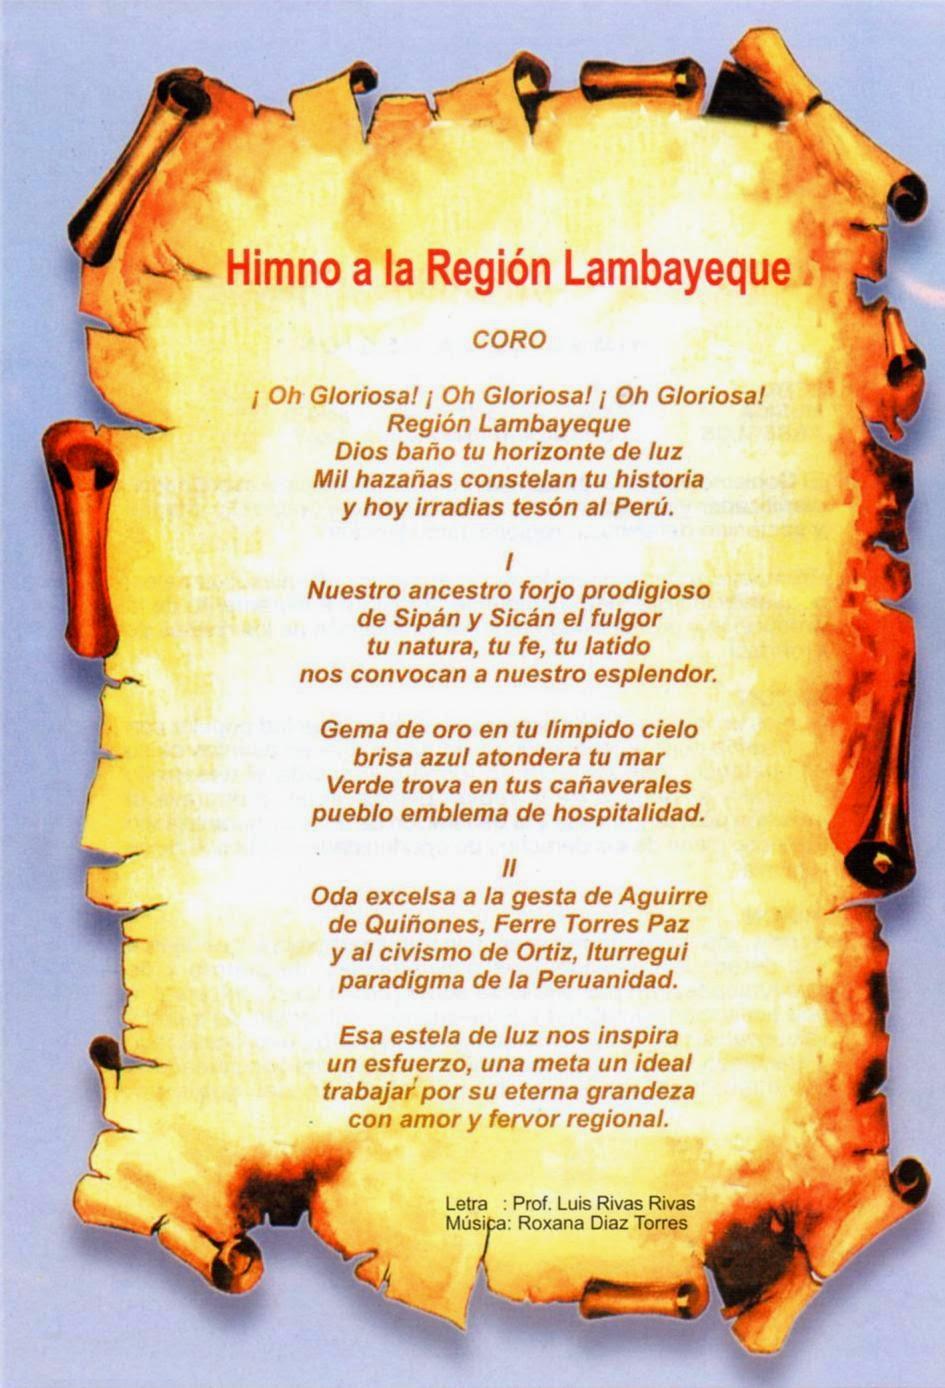 himno region lambayeque: